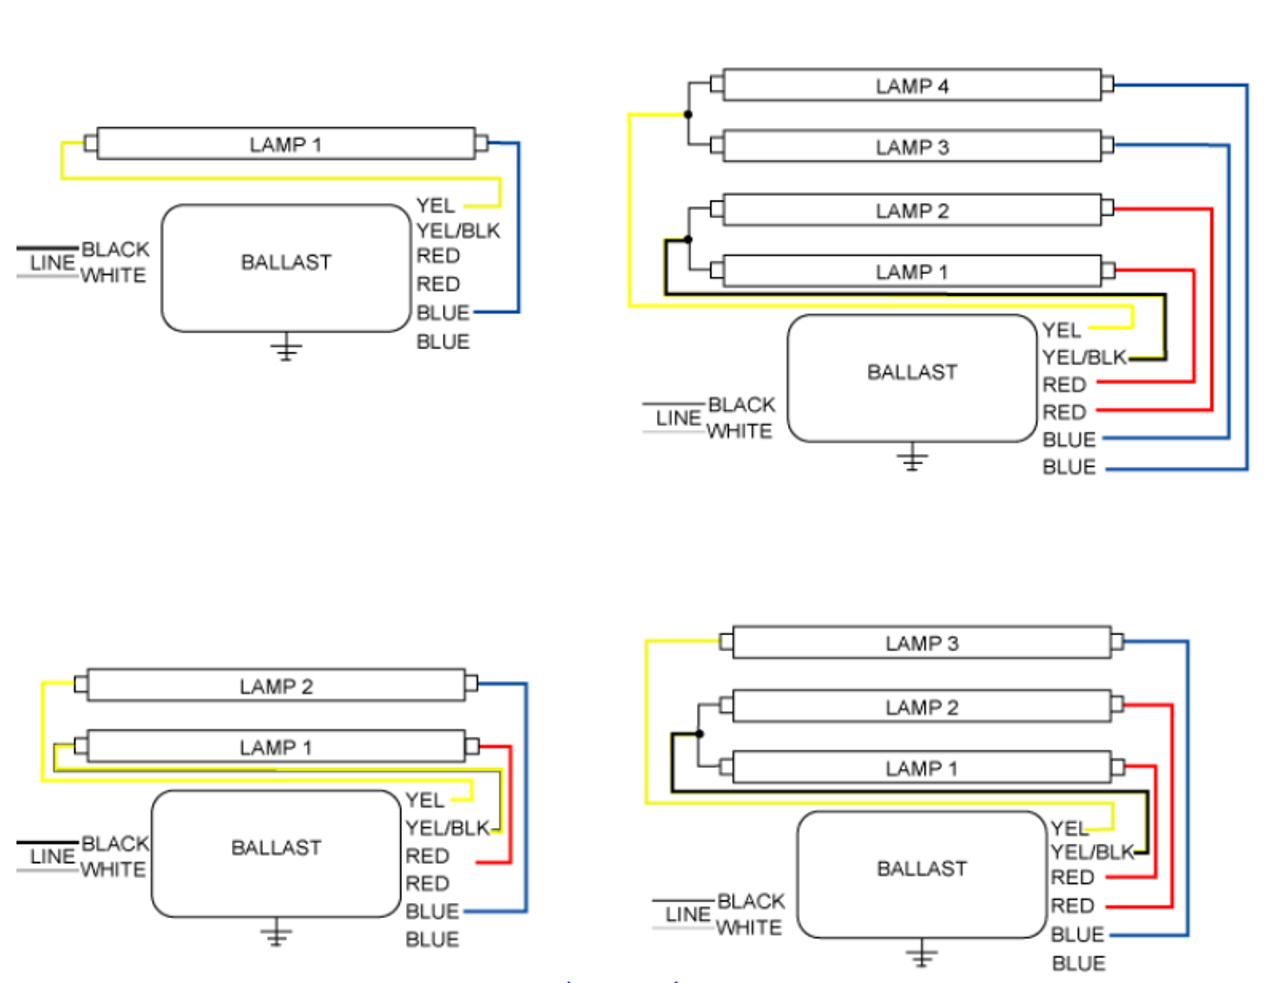 Asb Sign Ballast Wiring Diagram - Wiring Diagrams Rename Garmin Cradle Wiring Diagram on